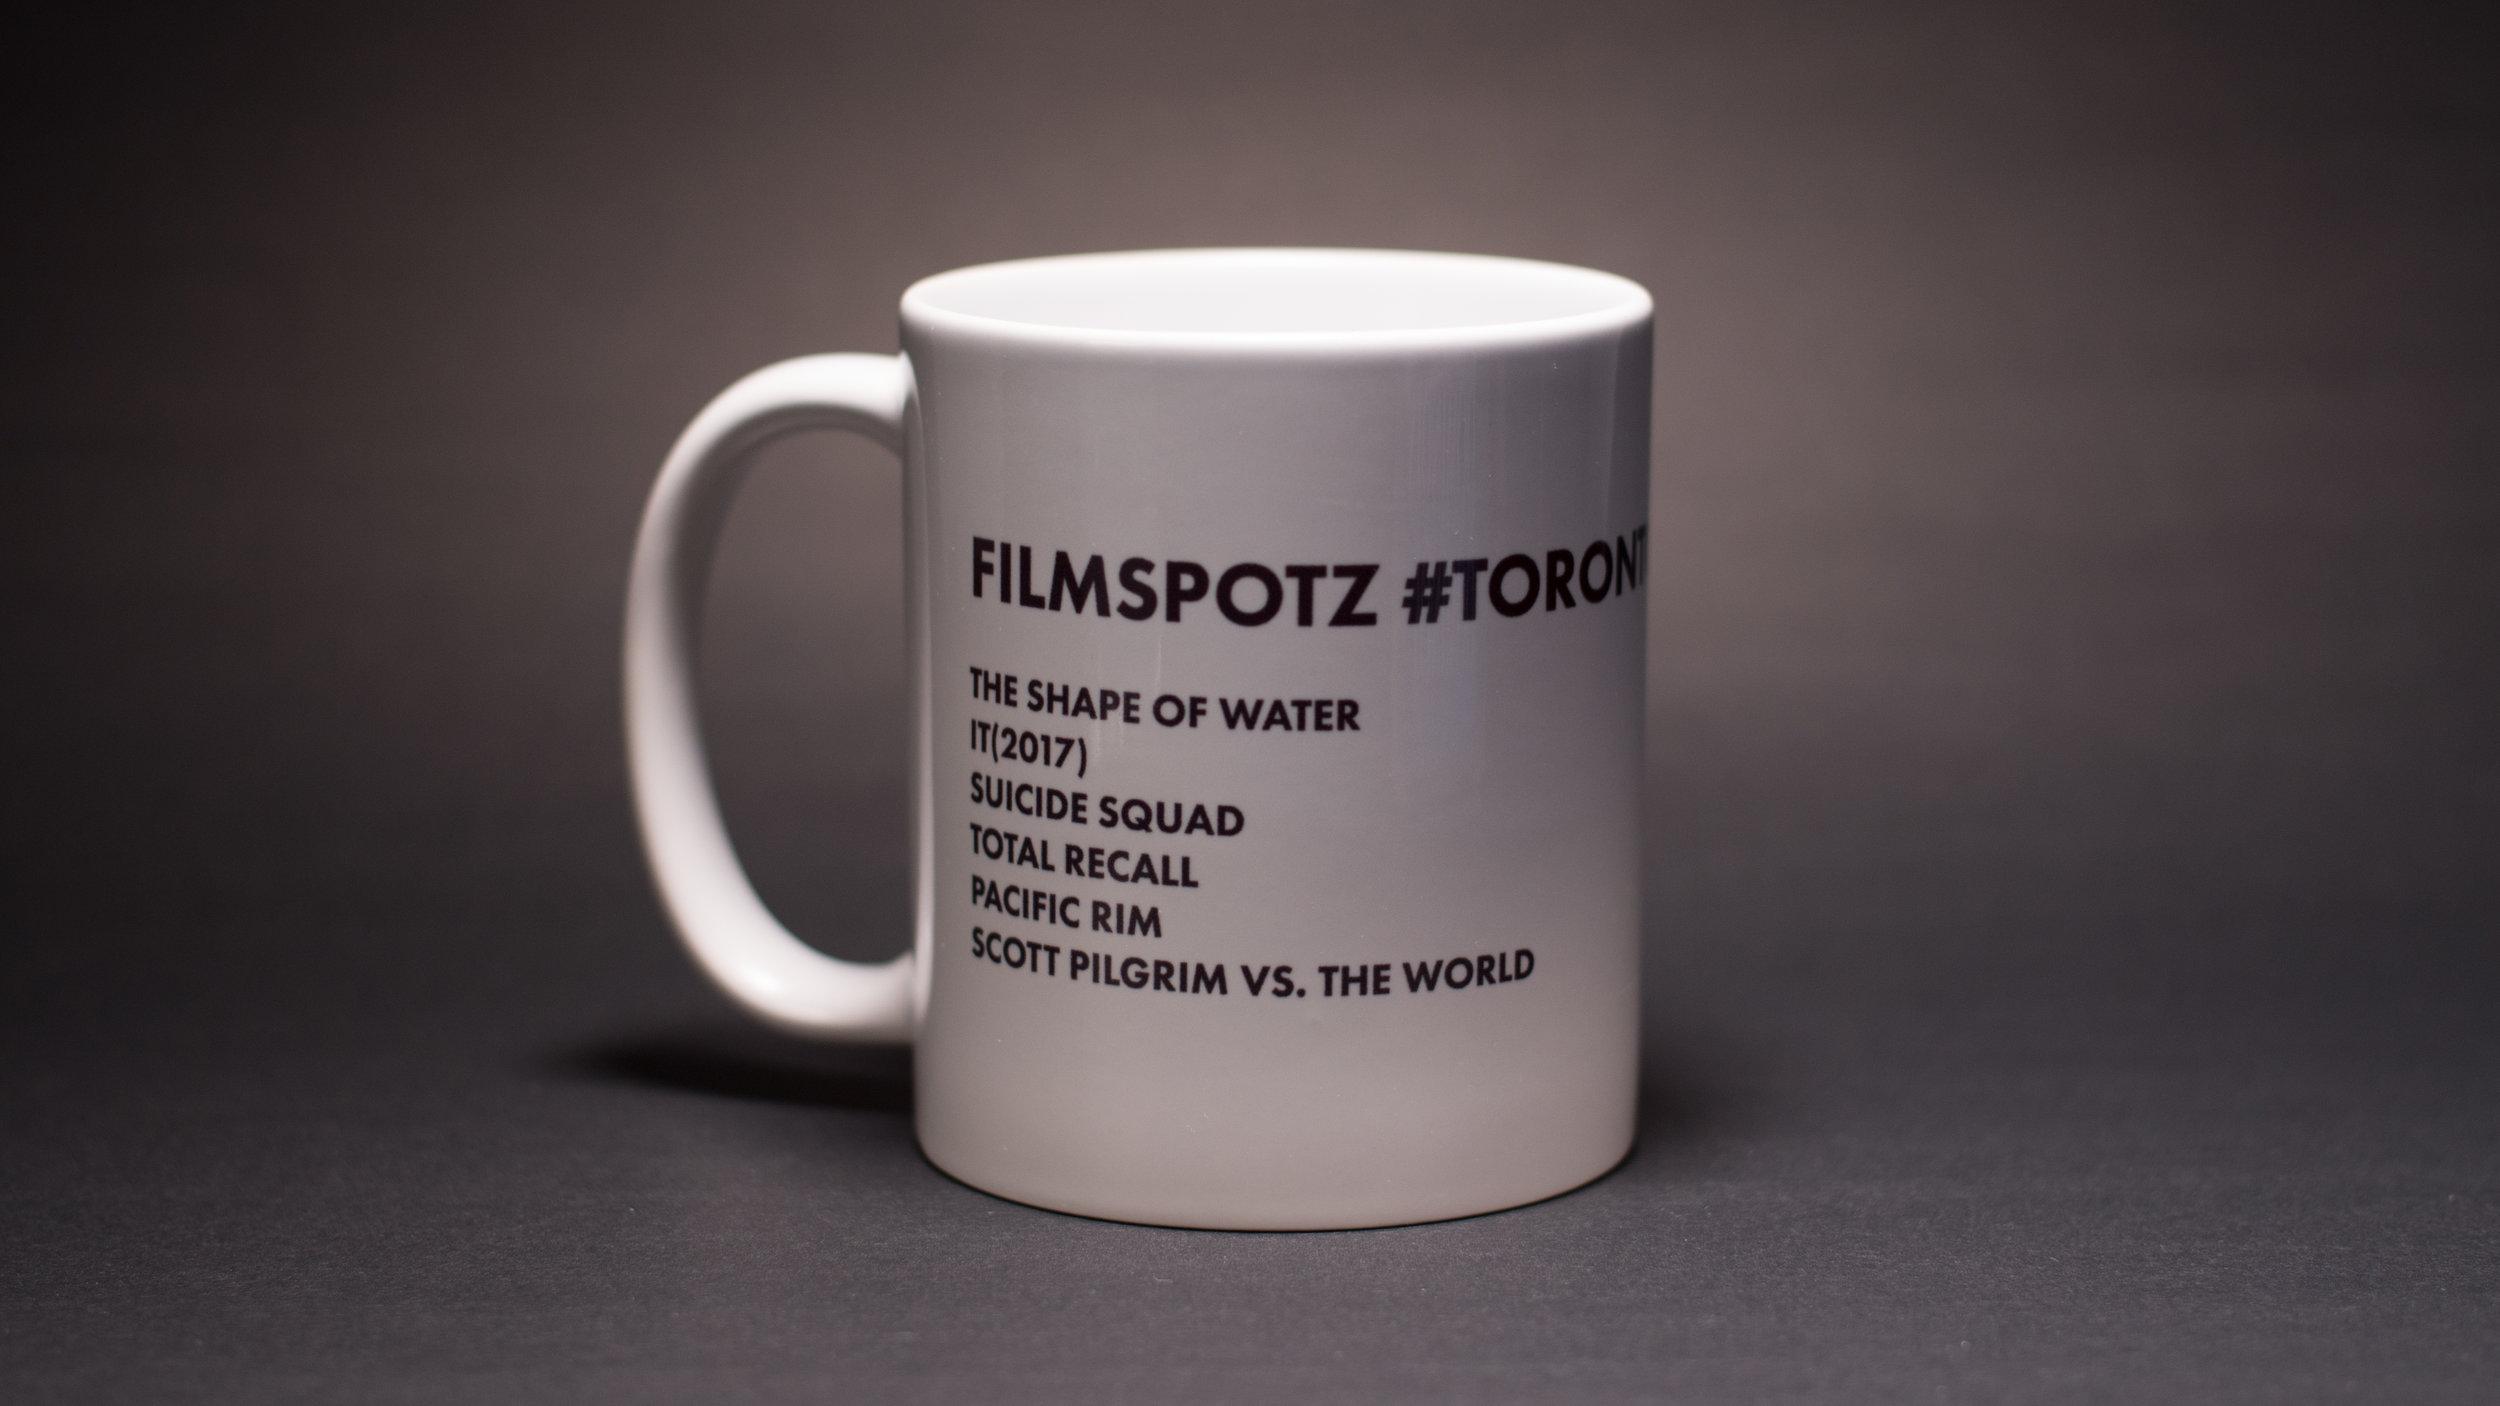 filmspotz_mug_1.JPG